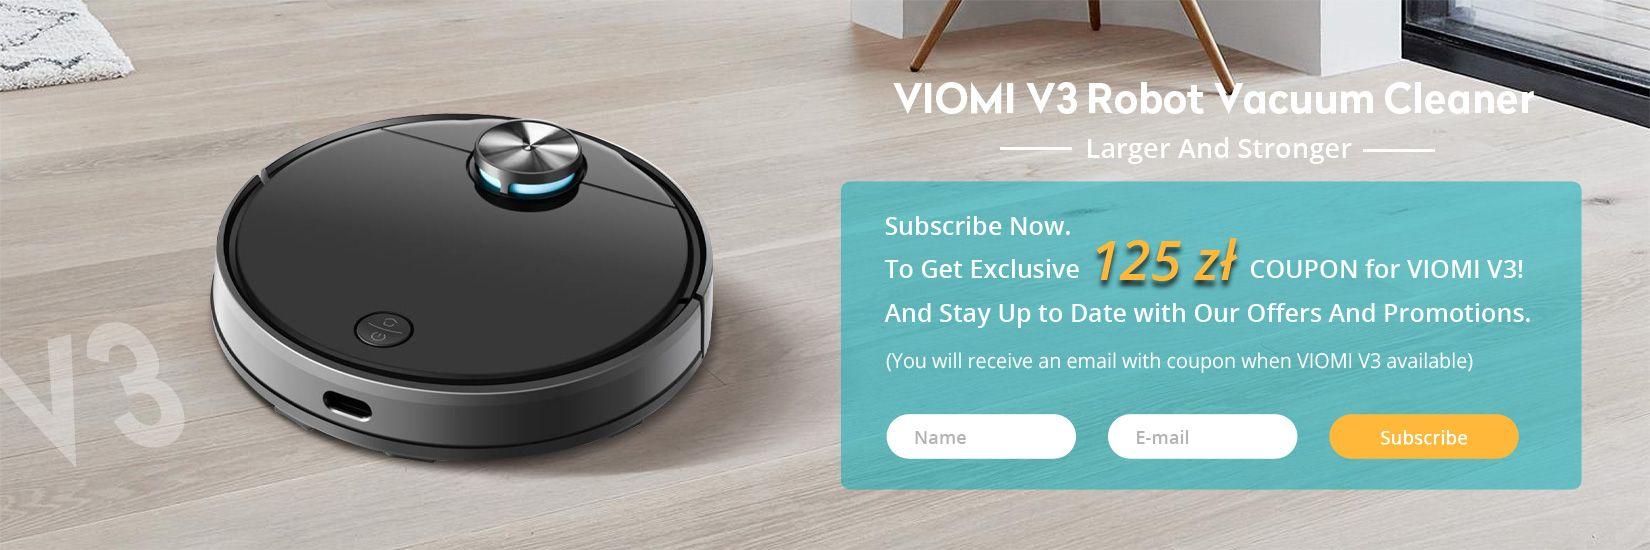 Xiaomi VIOMI V3 Robot Vacuum Cleaner Subscribe Activities - Geekbuying.pl